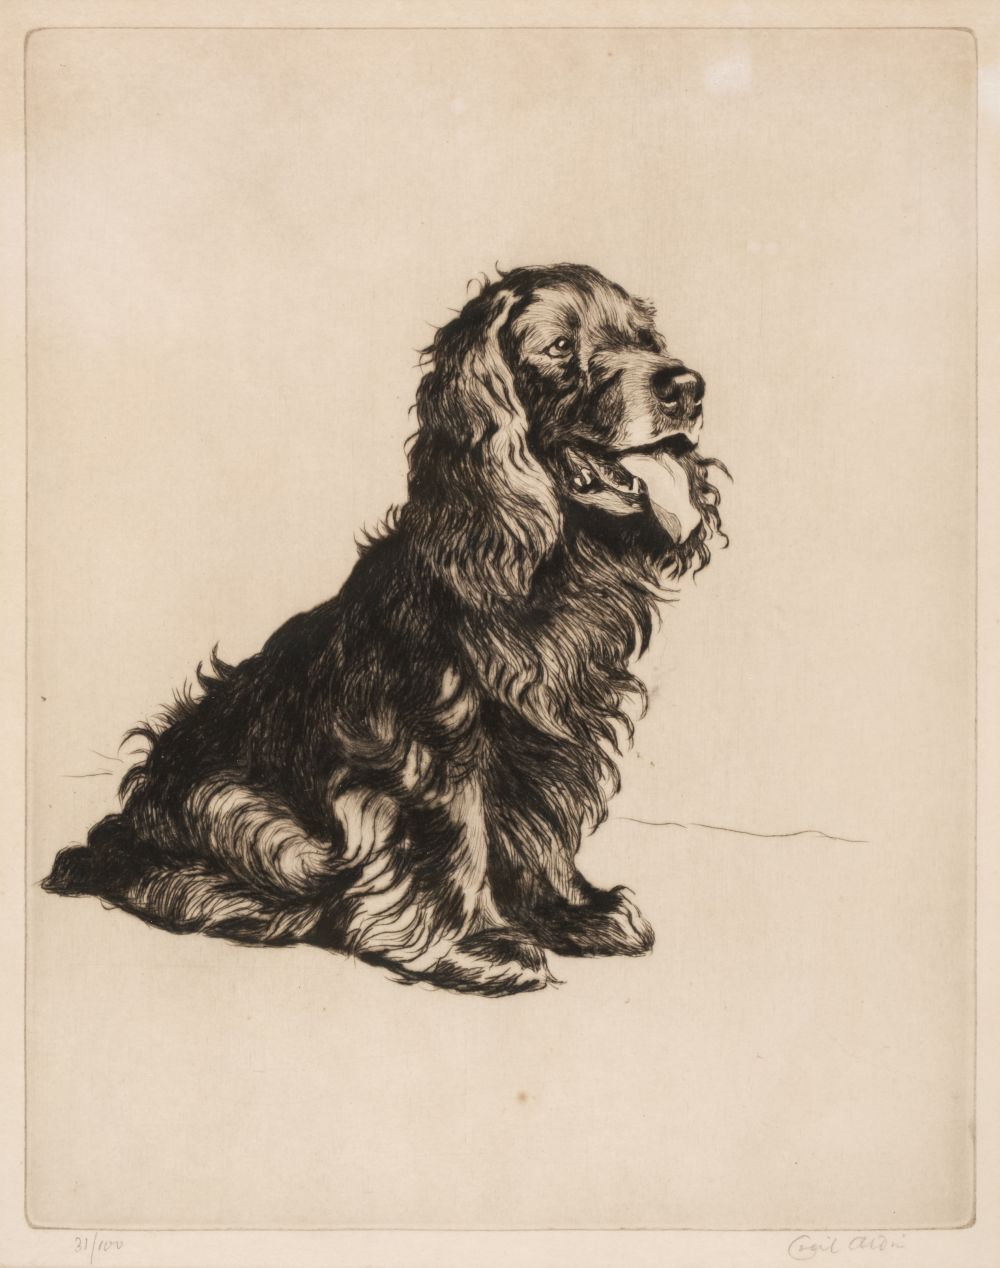 * Aldin (Cecil Charles Windsor, 1870 - 1935). A most Popular Gentleman (Spaniel)